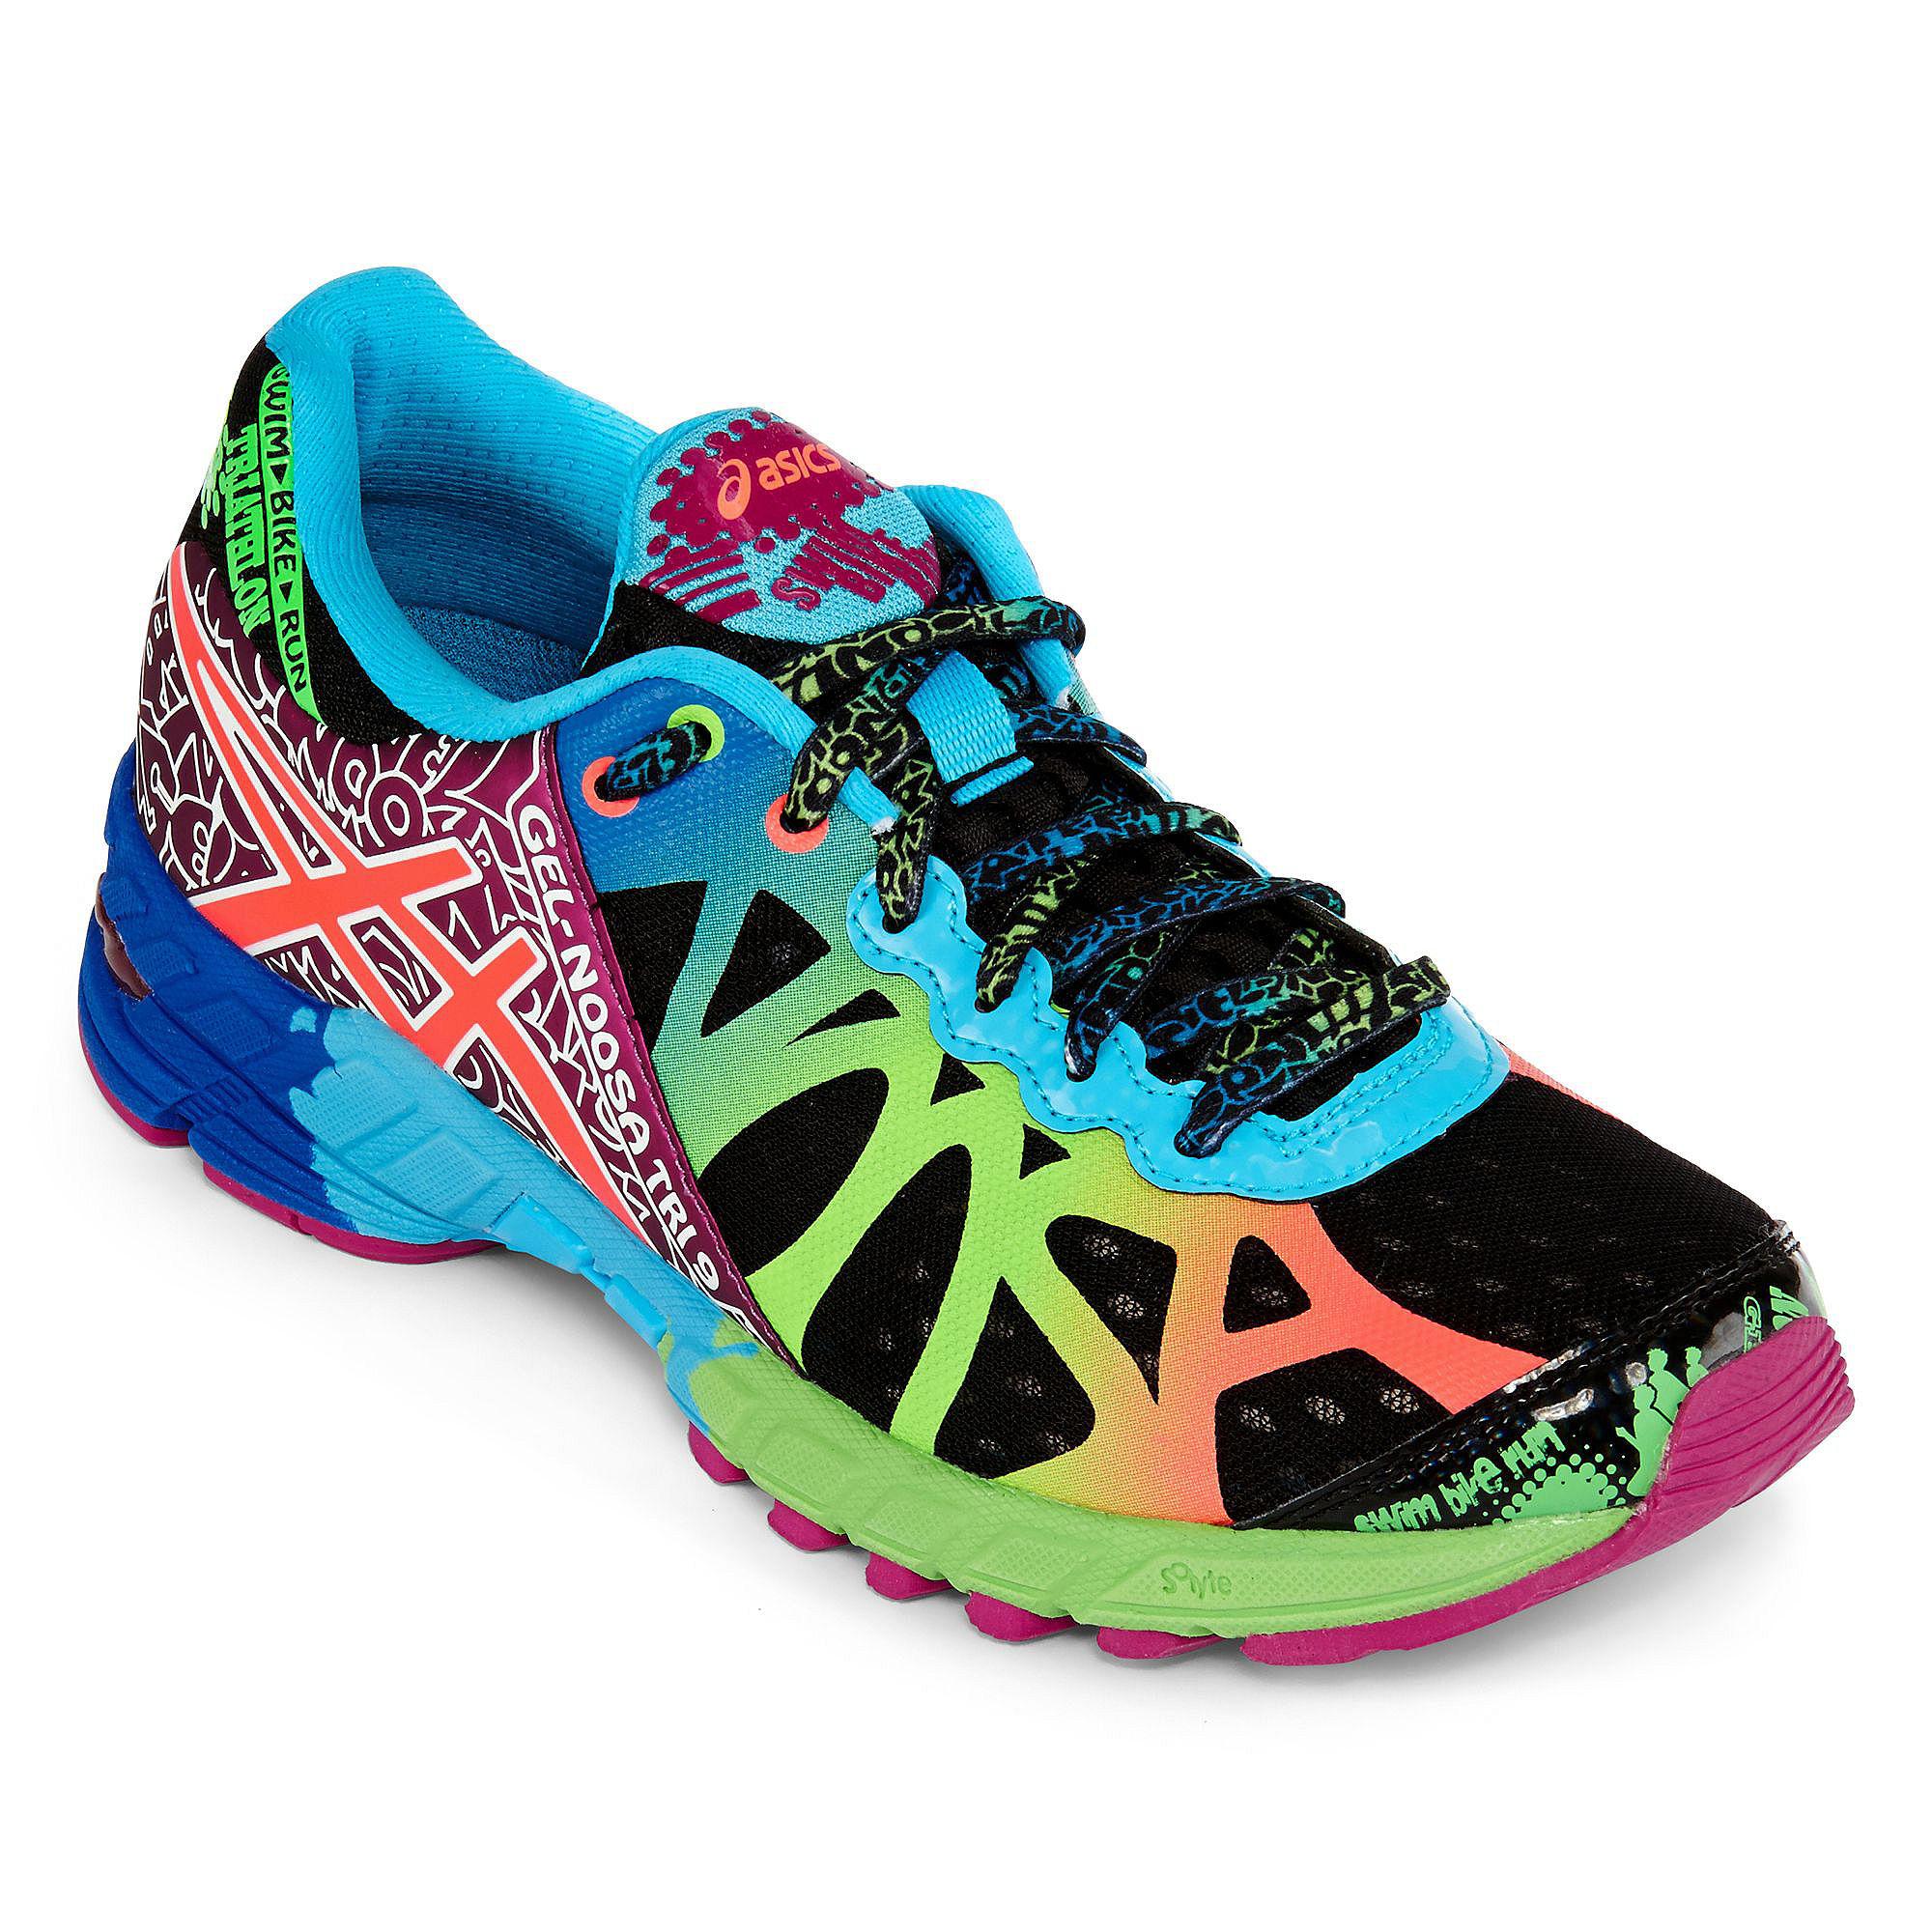 cheaper 8eff0 0f20d ... best price asics gel noosa tri 9 womens running shoes. upc 887749233544  f639c 3bf0a